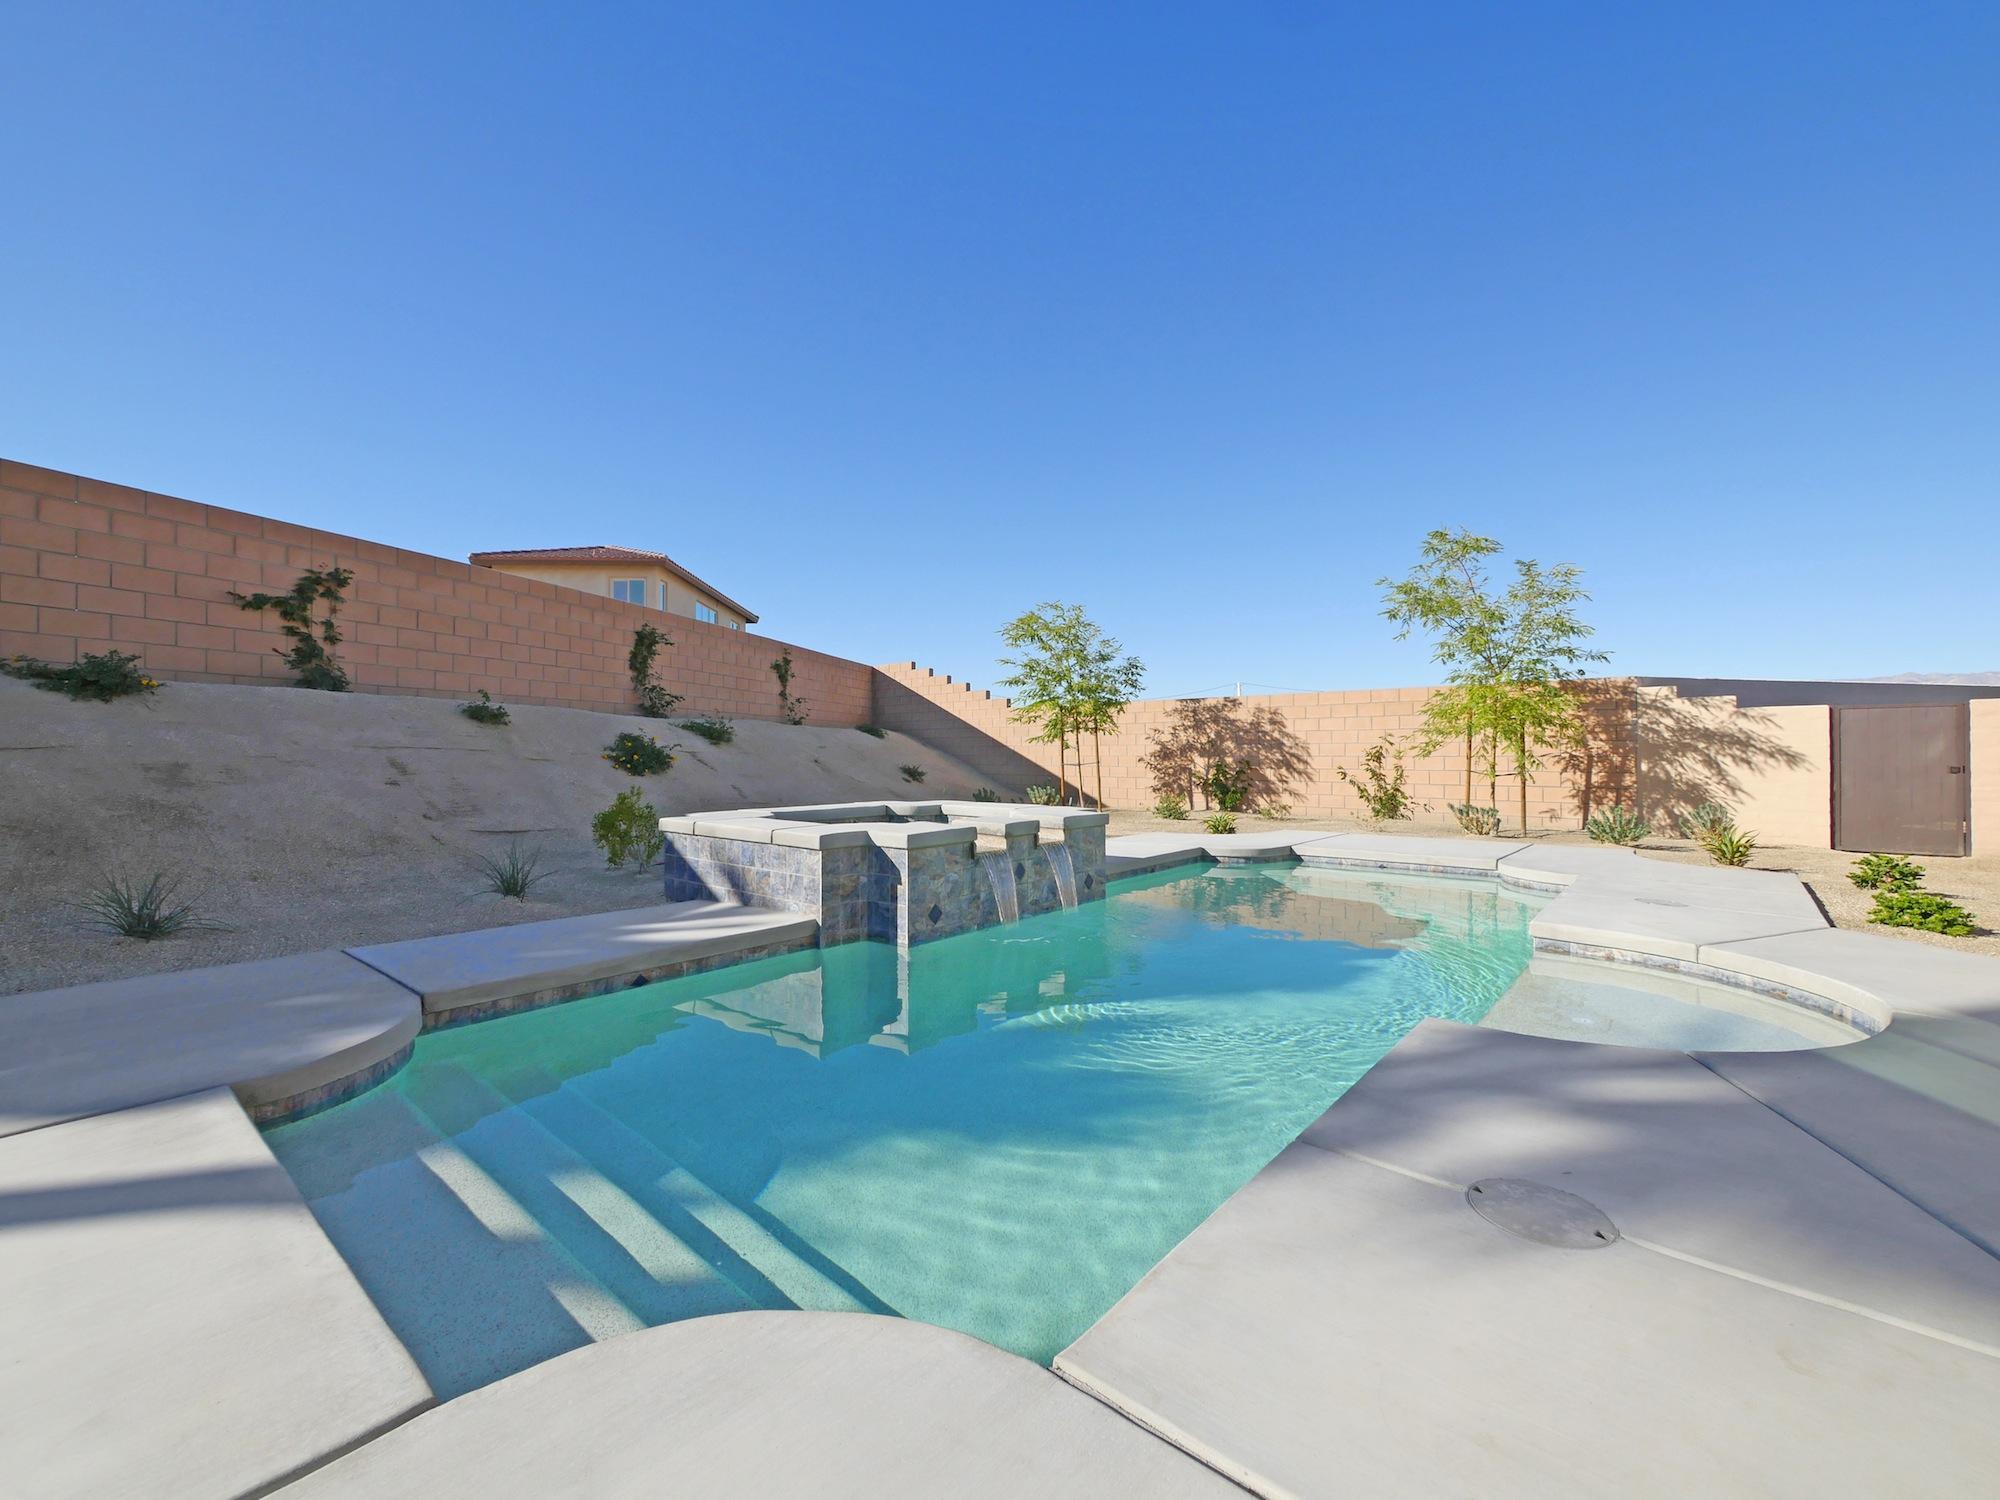 74471 Millennia Way, Palm Desert, California 92211, 3 Bedrooms Bedrooms, ,3 BathroomsBathrooms,Residential,For Sale,74471 Millennia Way,219037542